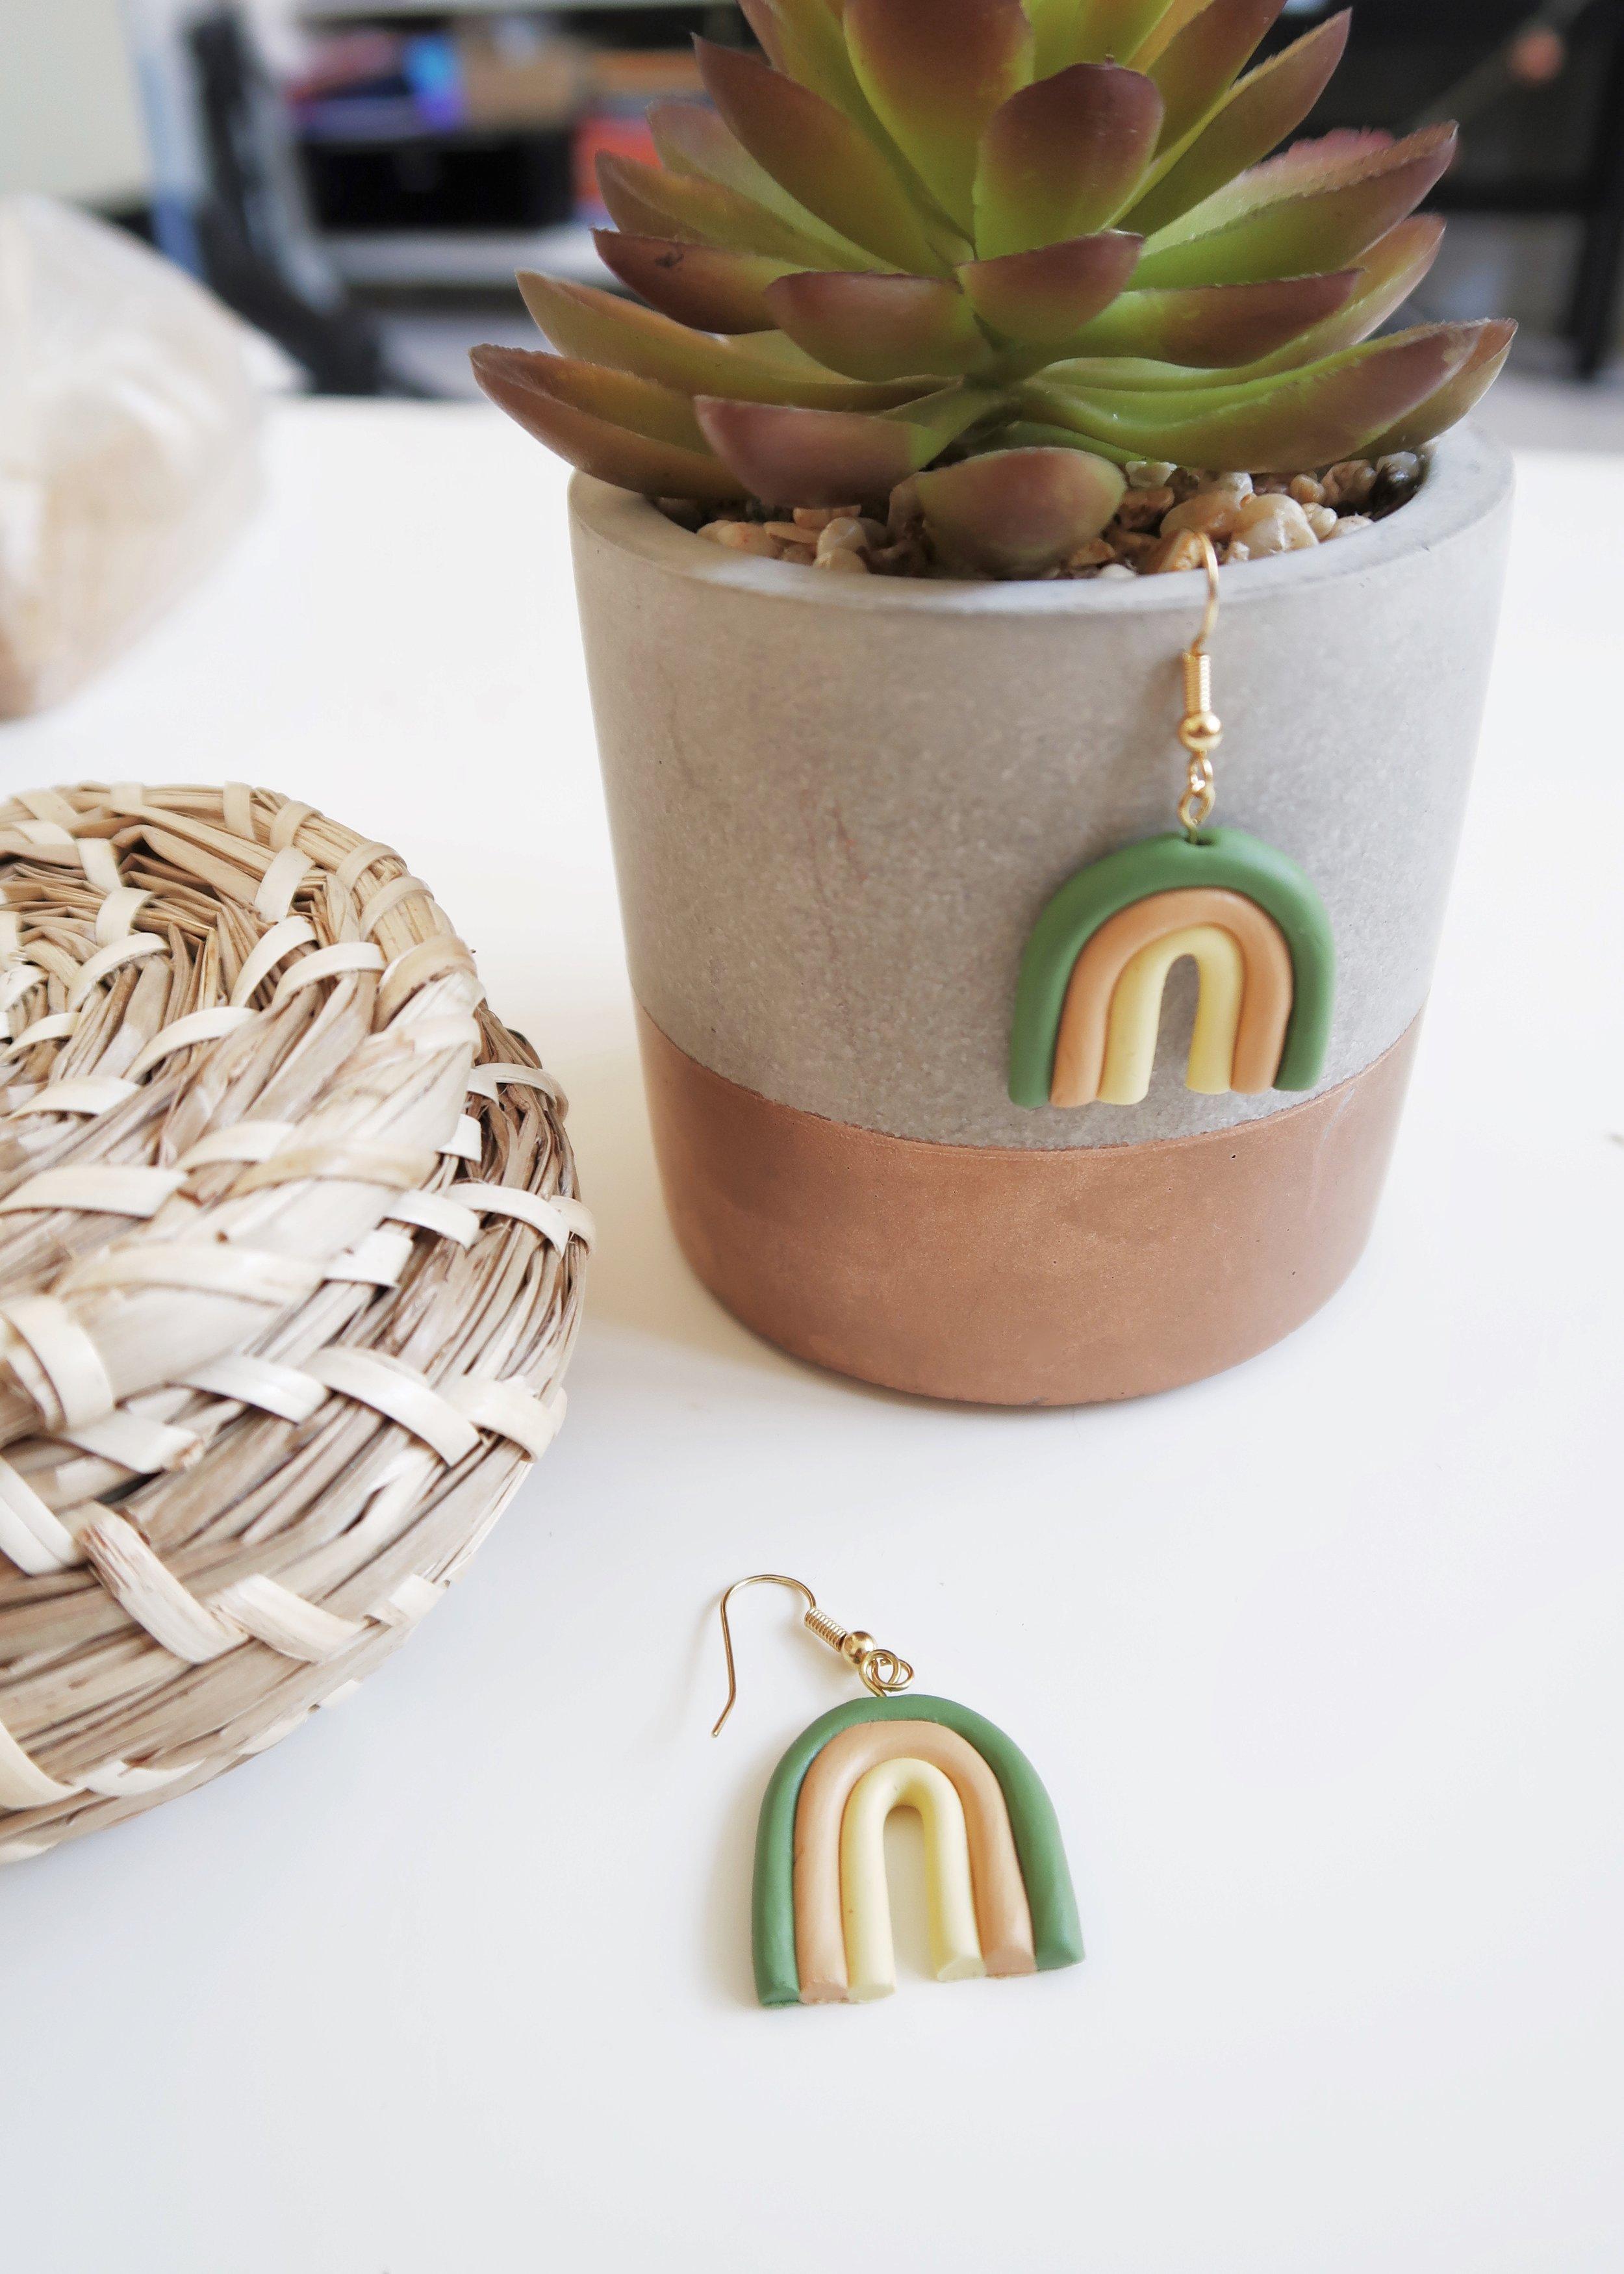 DIY Rainbow Earrings by Isoscella